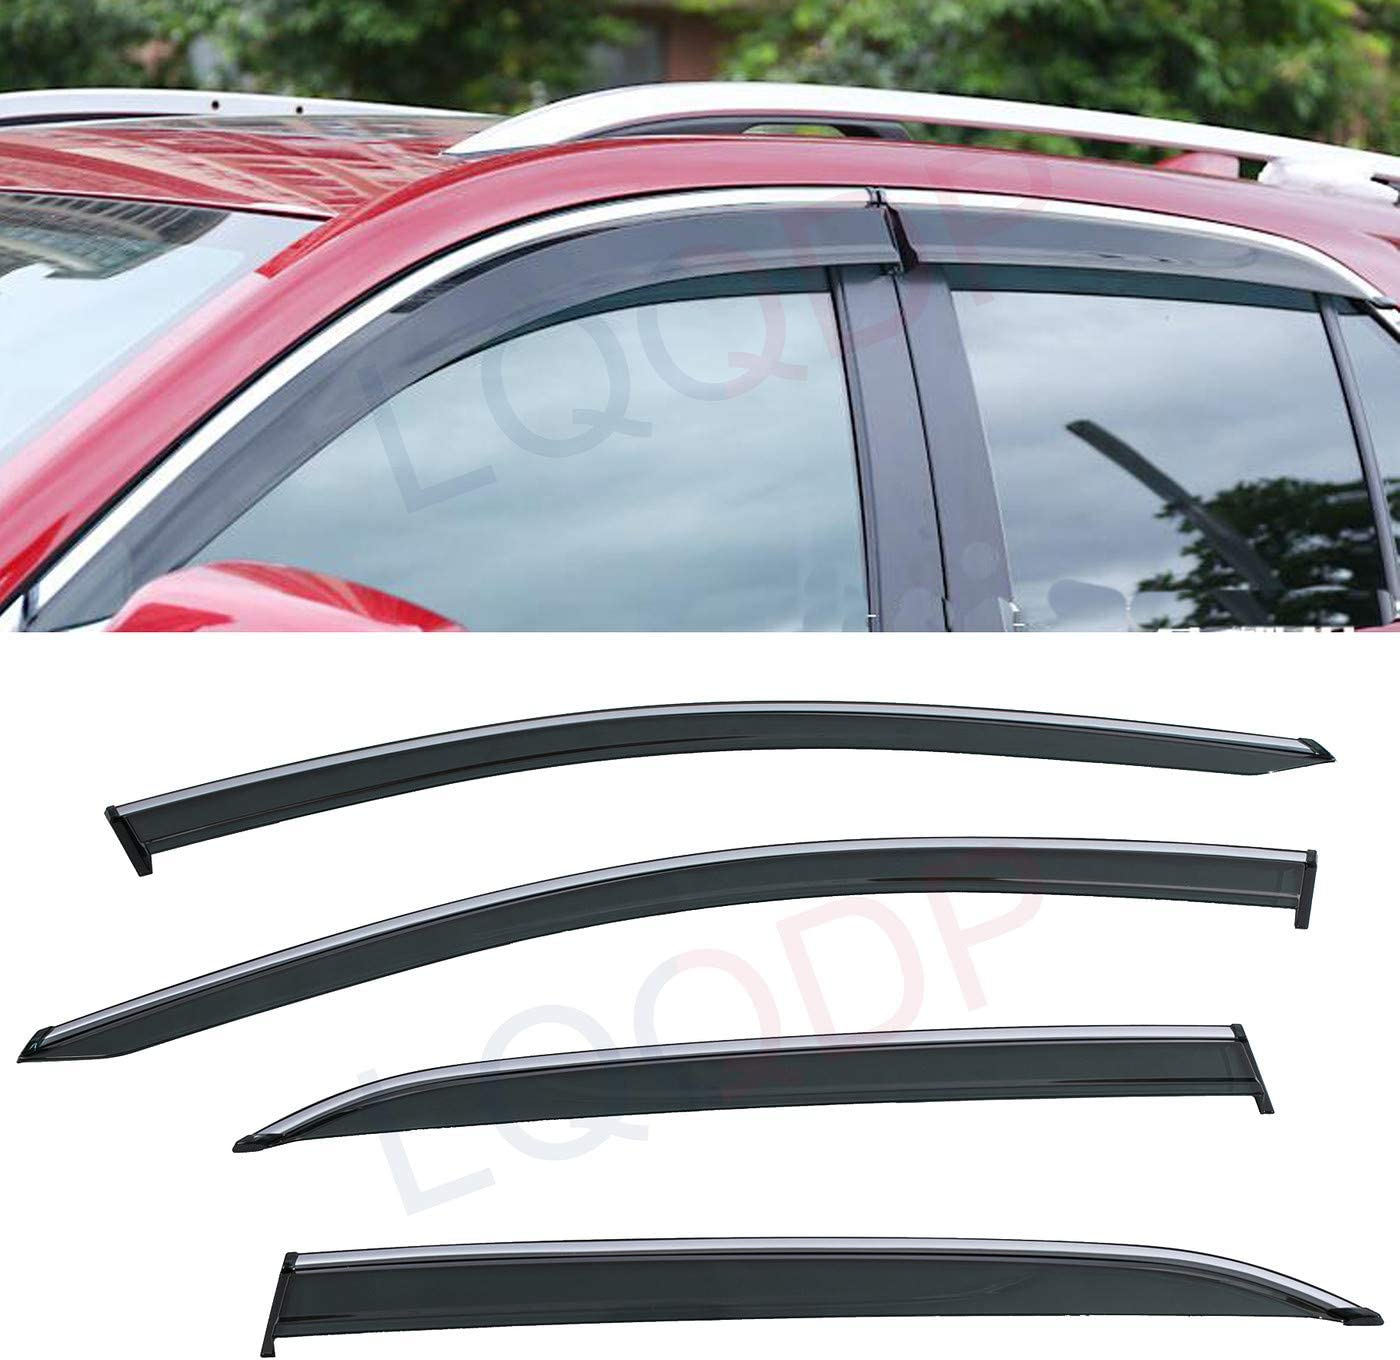 LQQDP 4pcs Smoke Tint With Chrome Trim Outside Mount Tape On//Clip On Style PVC Sun Rain Guard Vent Window Visors Fit 18-20 Chevy Equinox